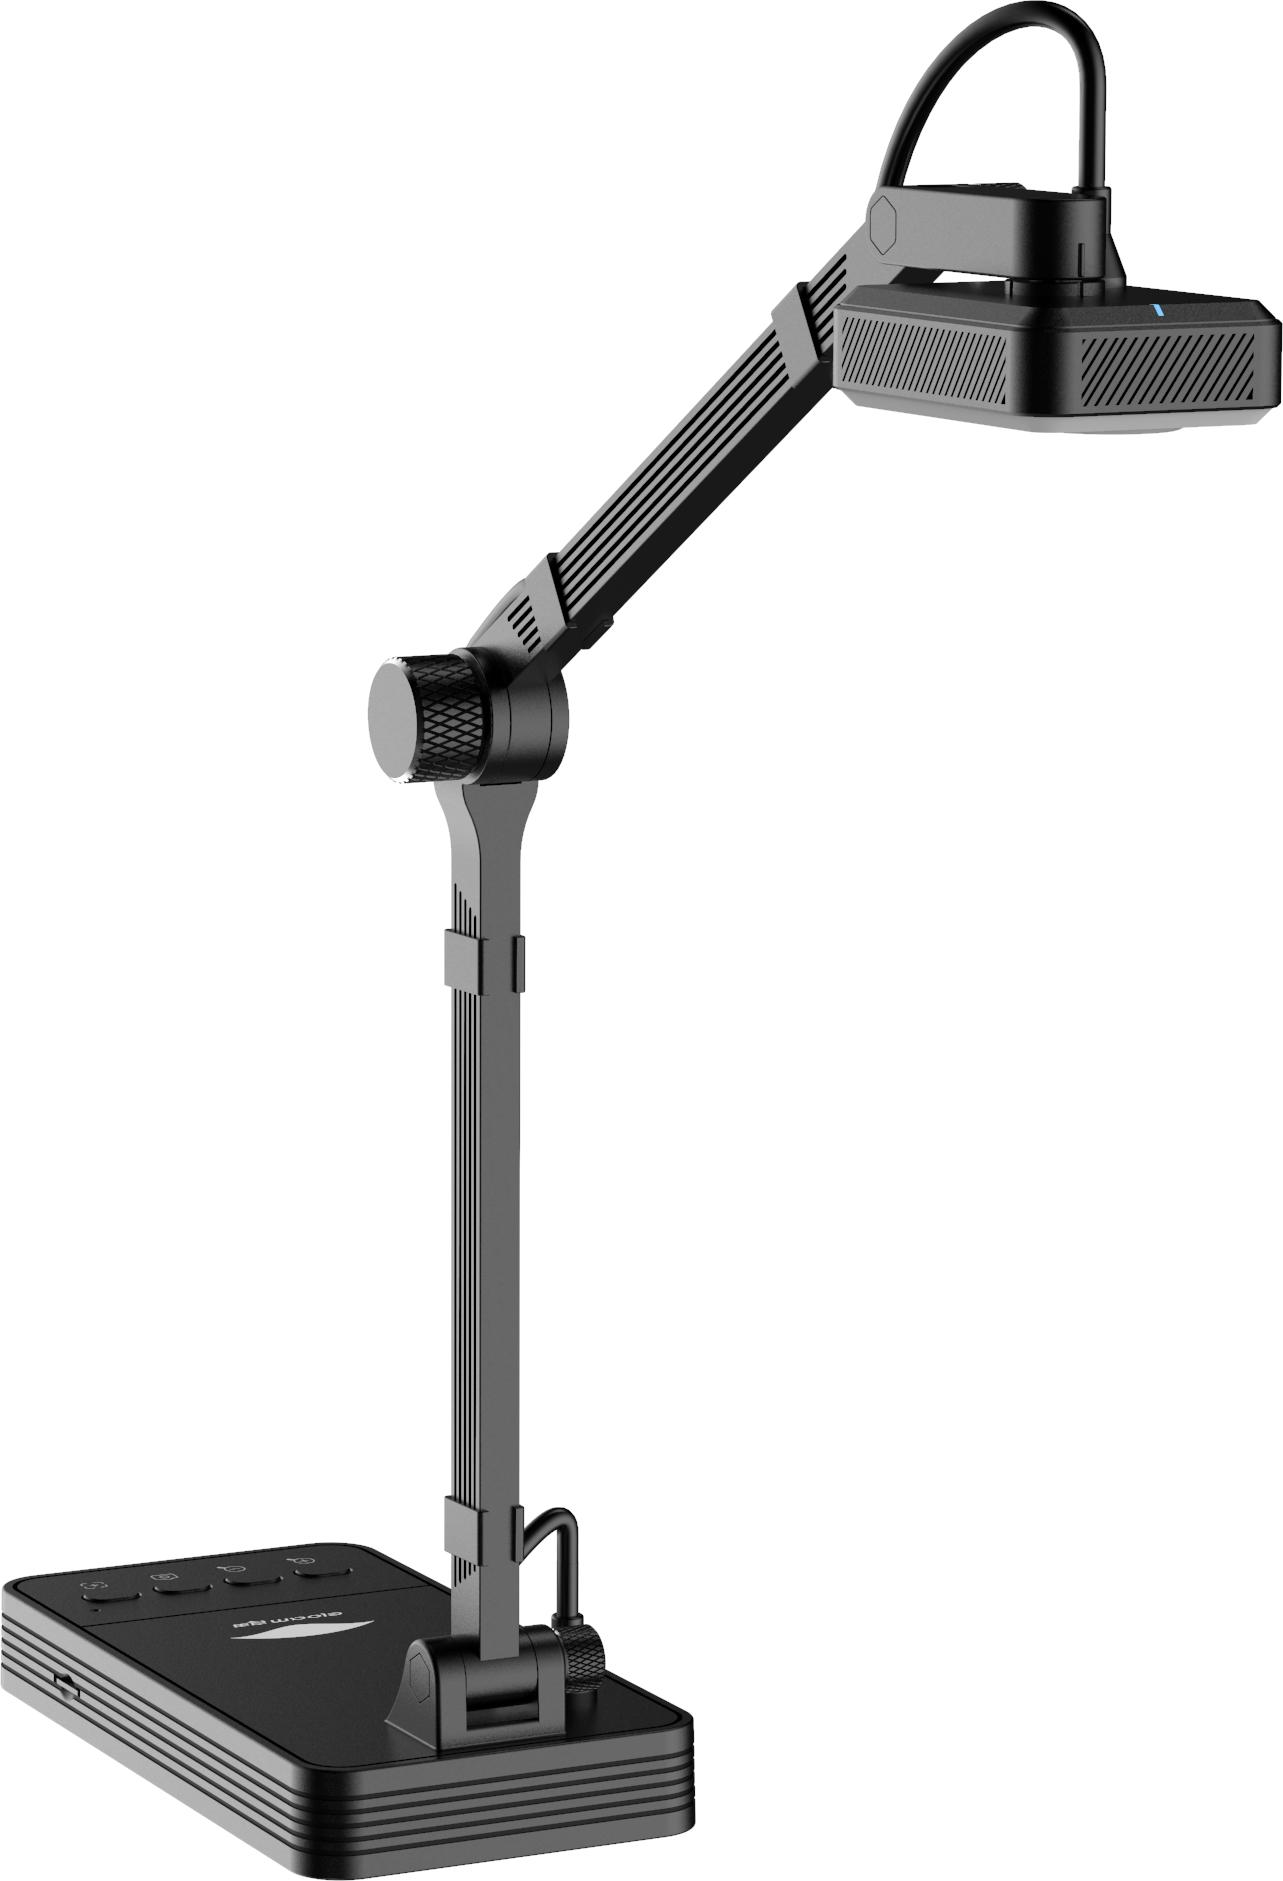 Eloam YL1050 كاميرا للمستندات المحمولة HDMI ، منفذ VGA ، OCR المقدم البصري للمكتب والمدرسة والاجتماع والتدريب وعرض مختبرات